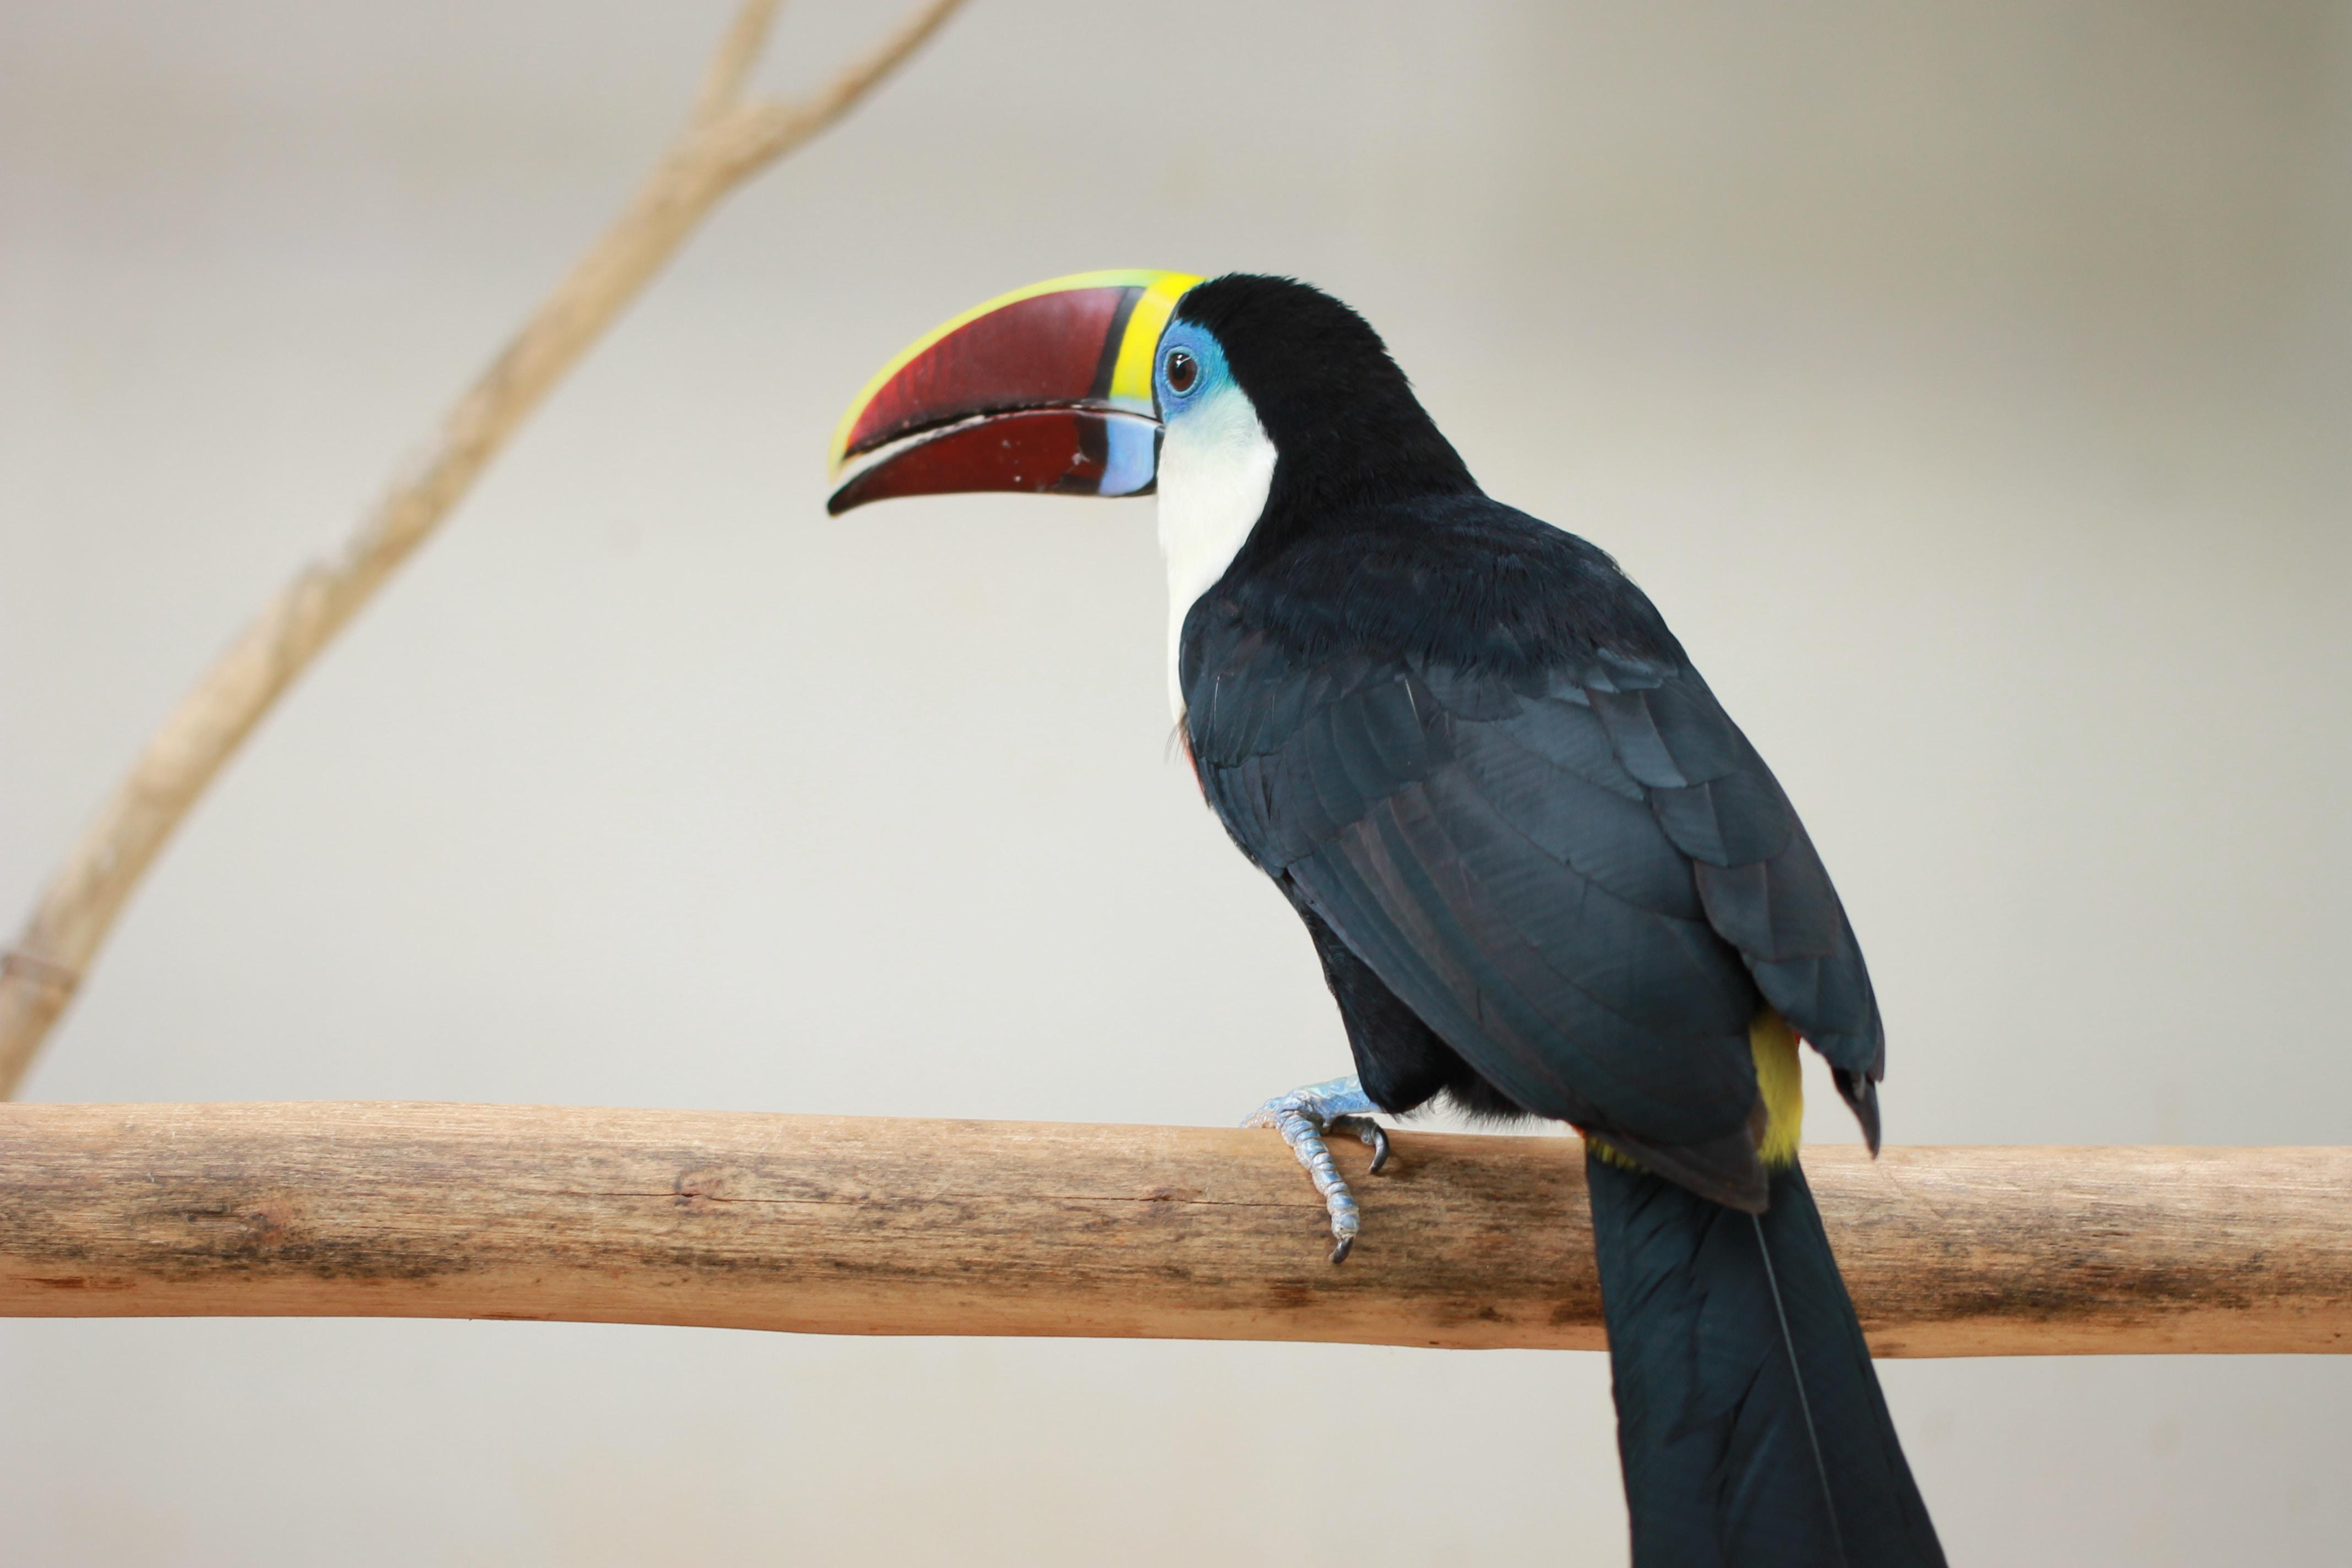 red long beak bird on steam